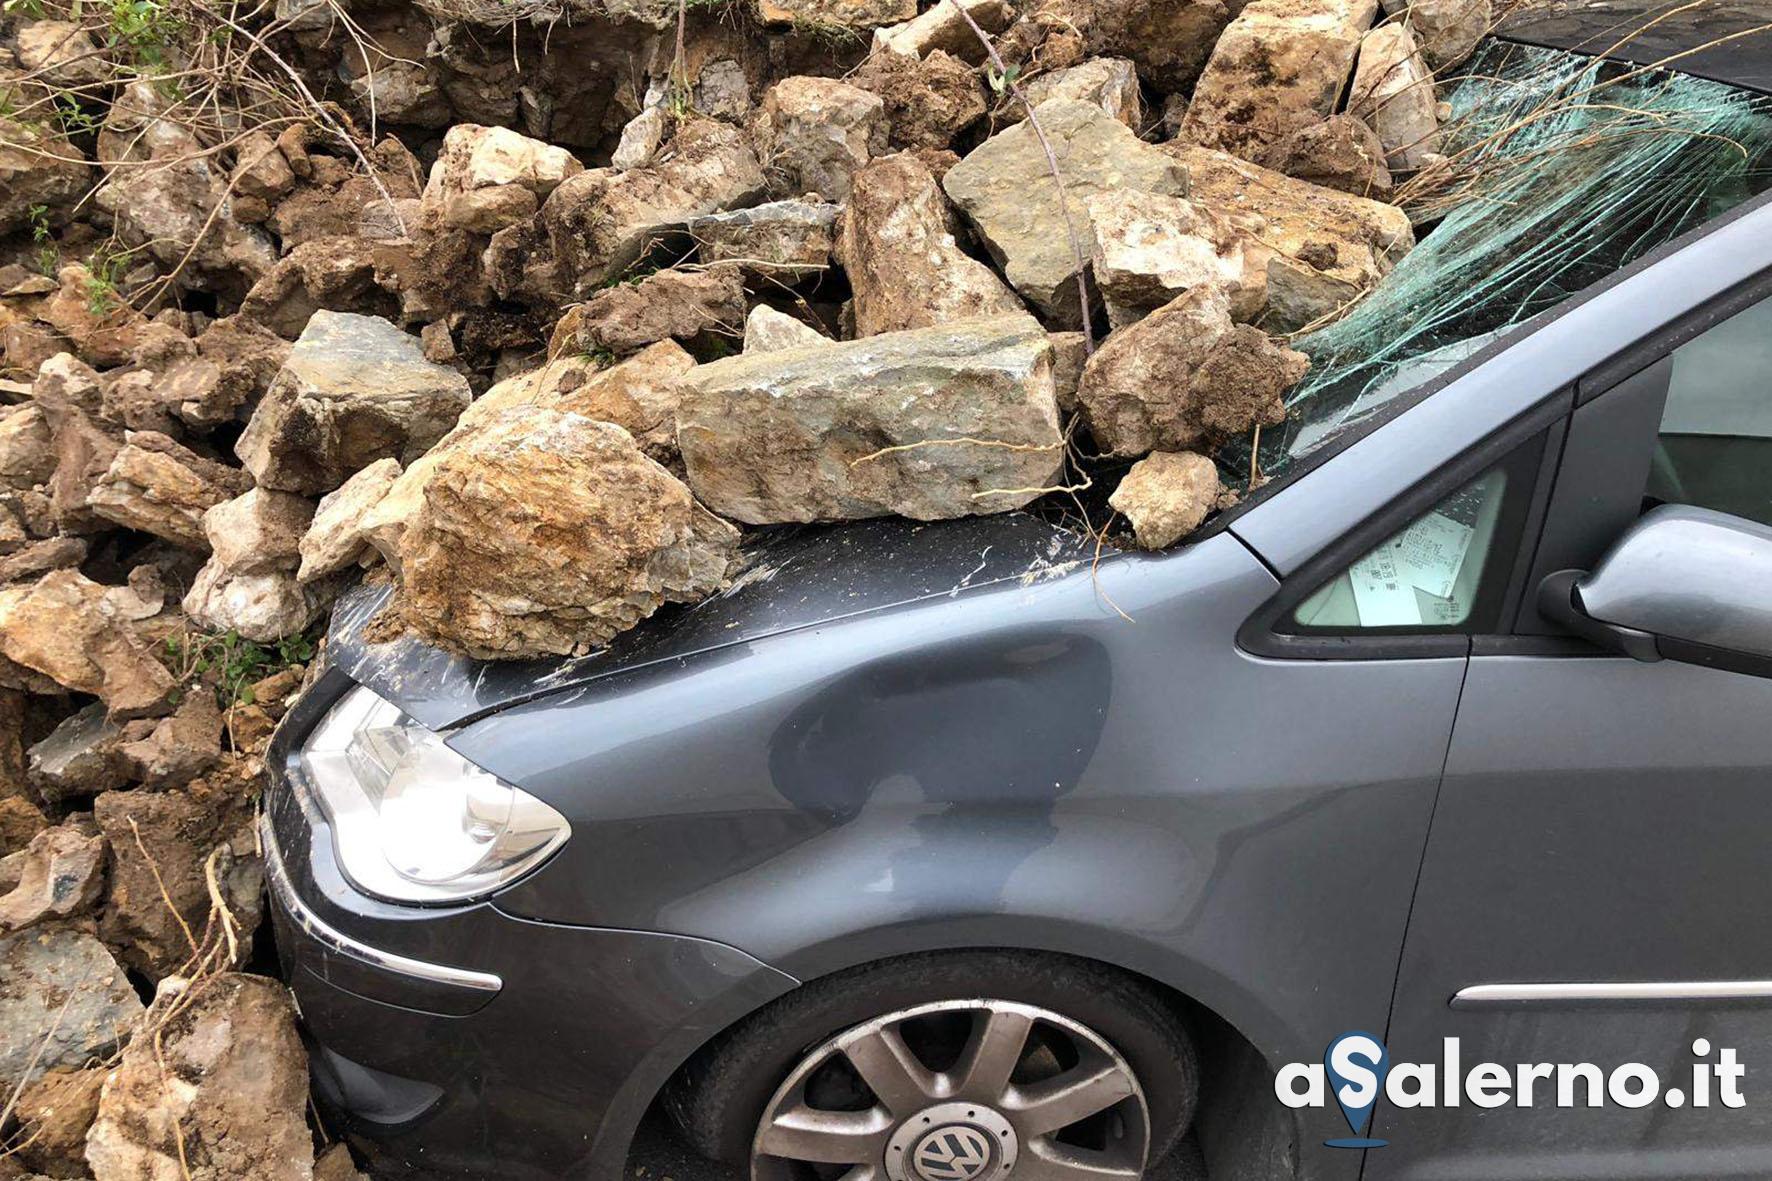 SAL - 25 01 2019 Ravello. Frana nei pressi dell'Auditorium.